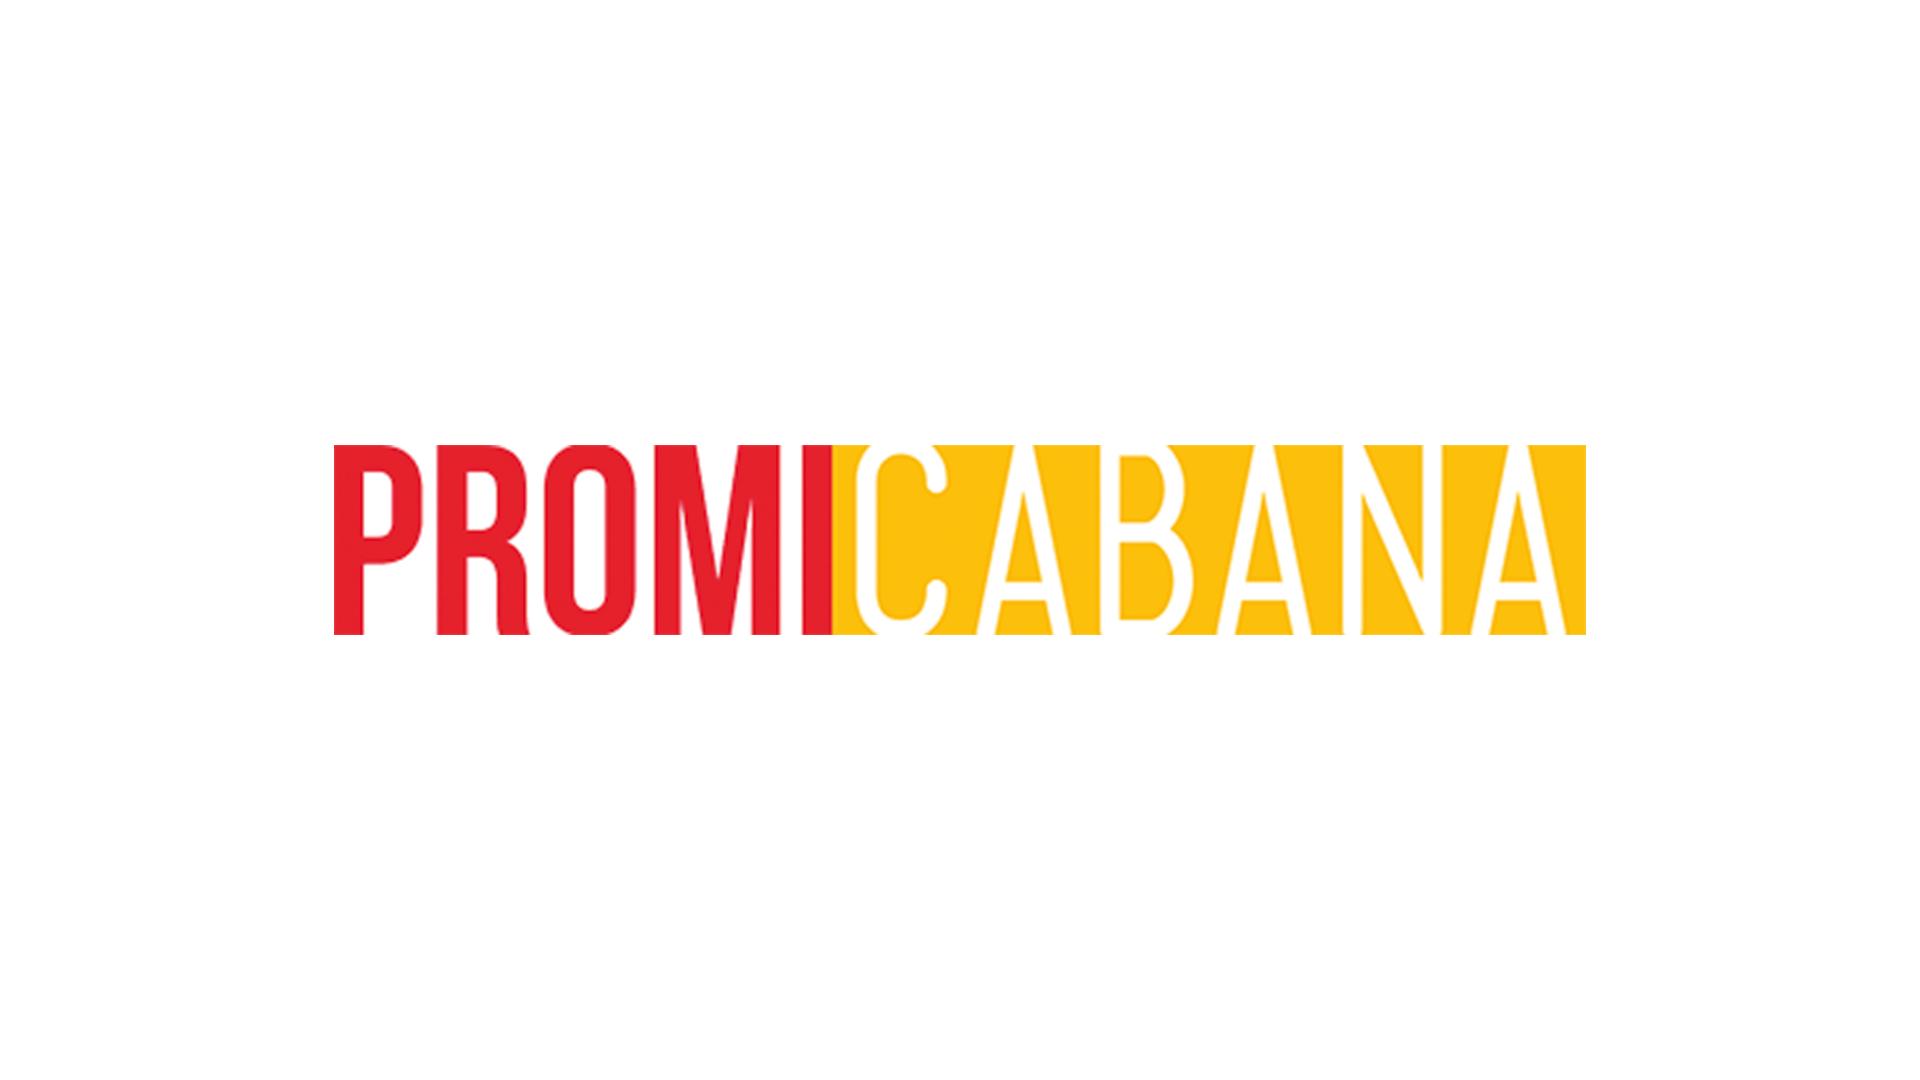 Hailee-Steinfeld-Capital-Letters-Musikvideo